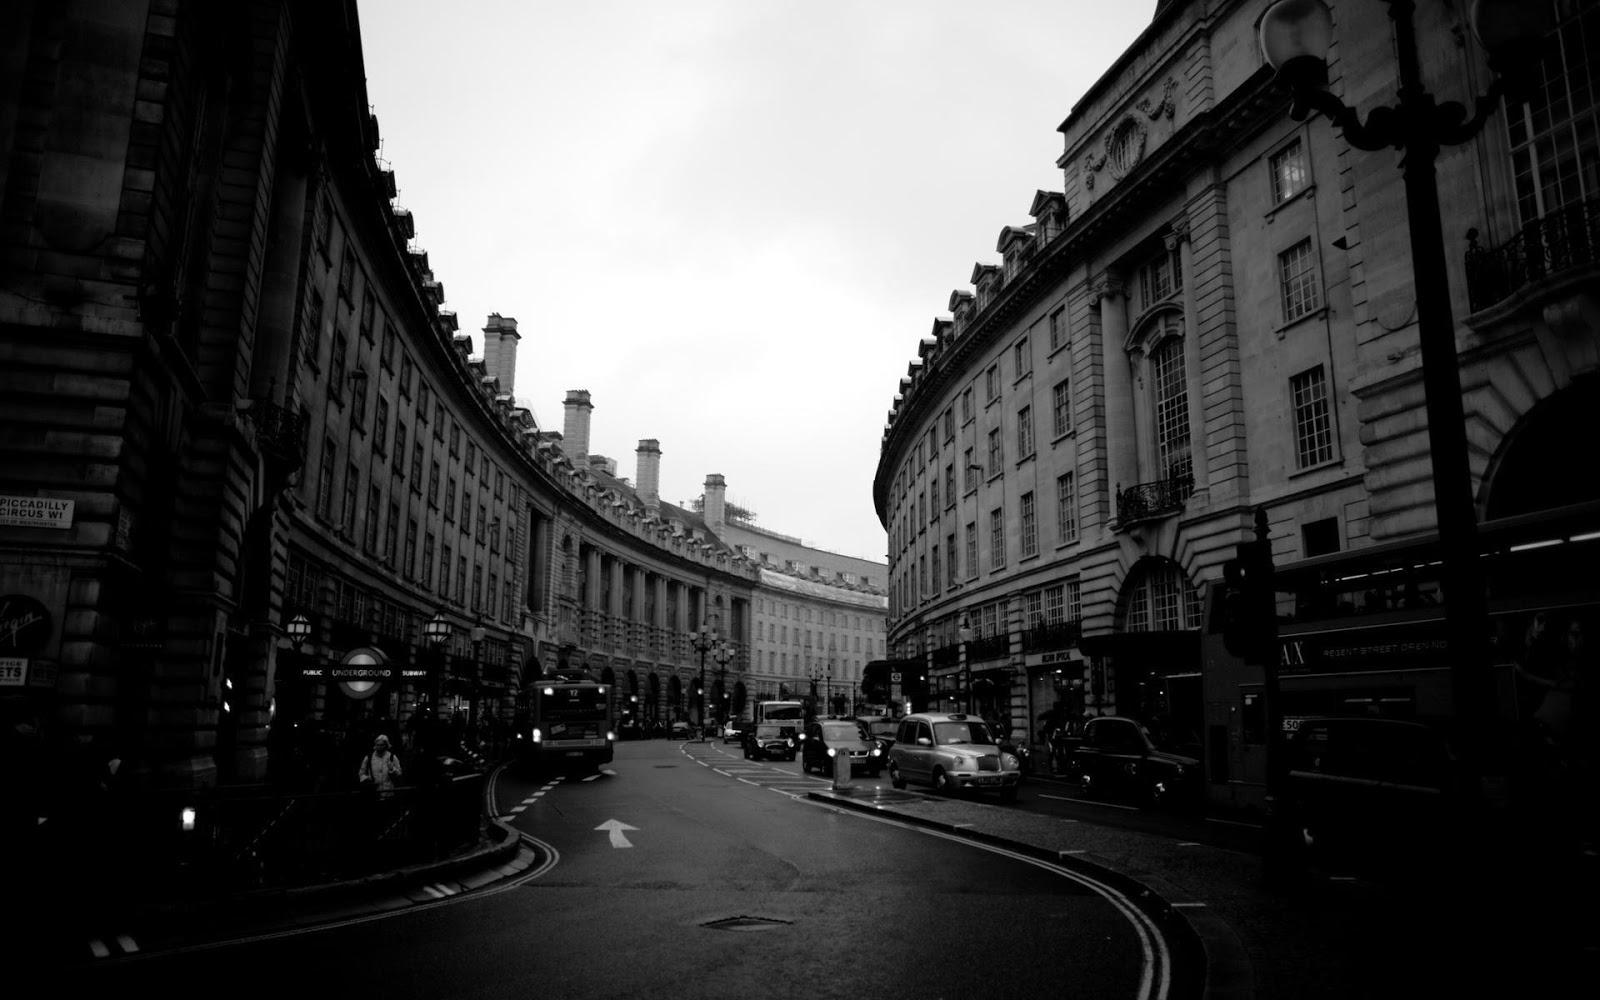 london high resolution - photo #42